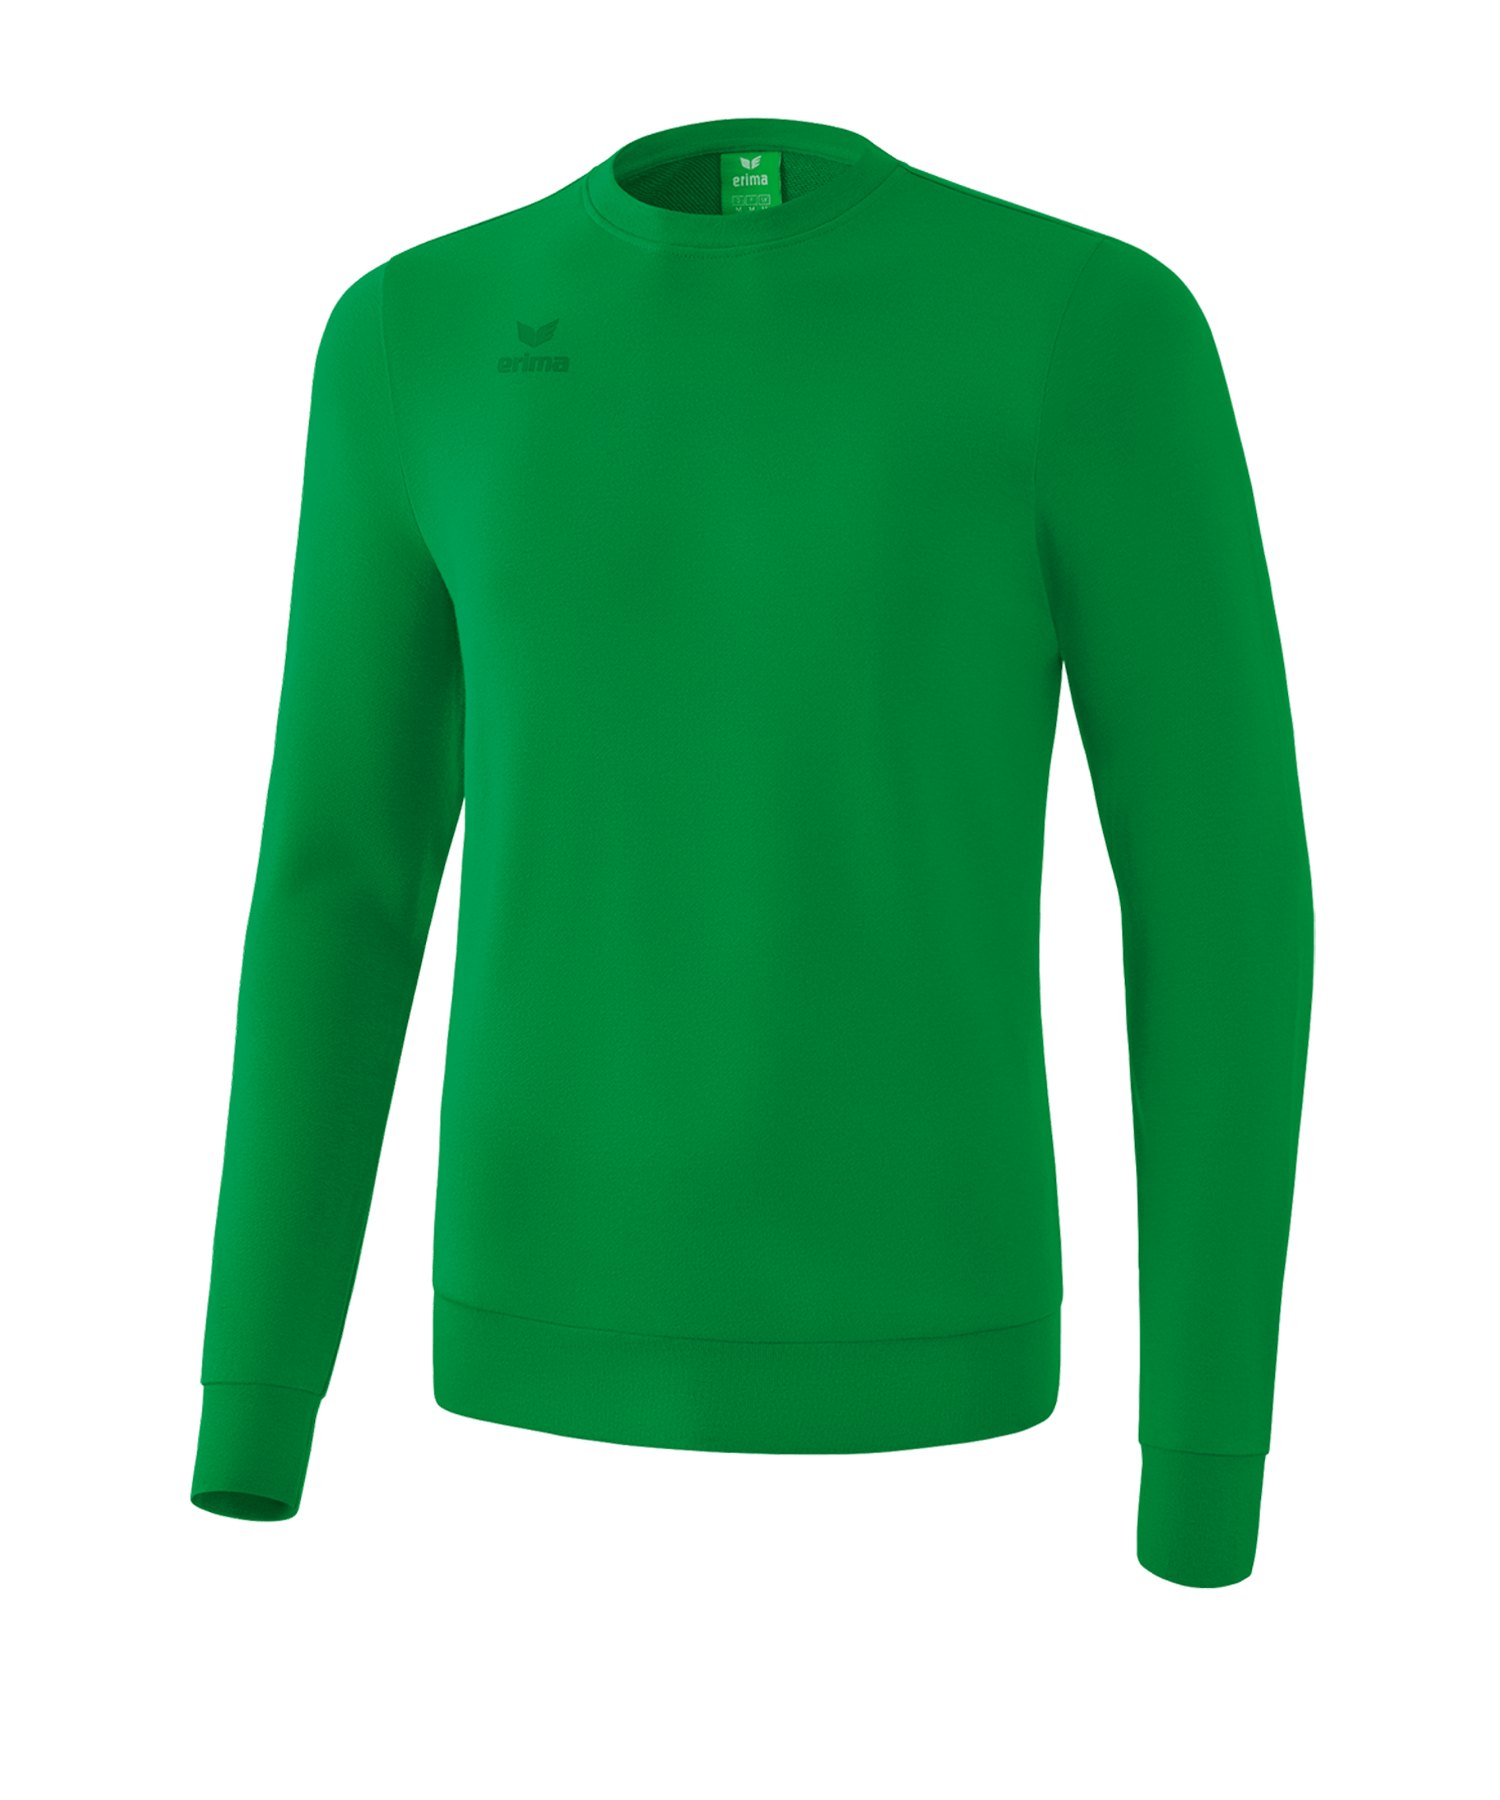 Erima Basic Sweatshirt Kids Grün - gruen